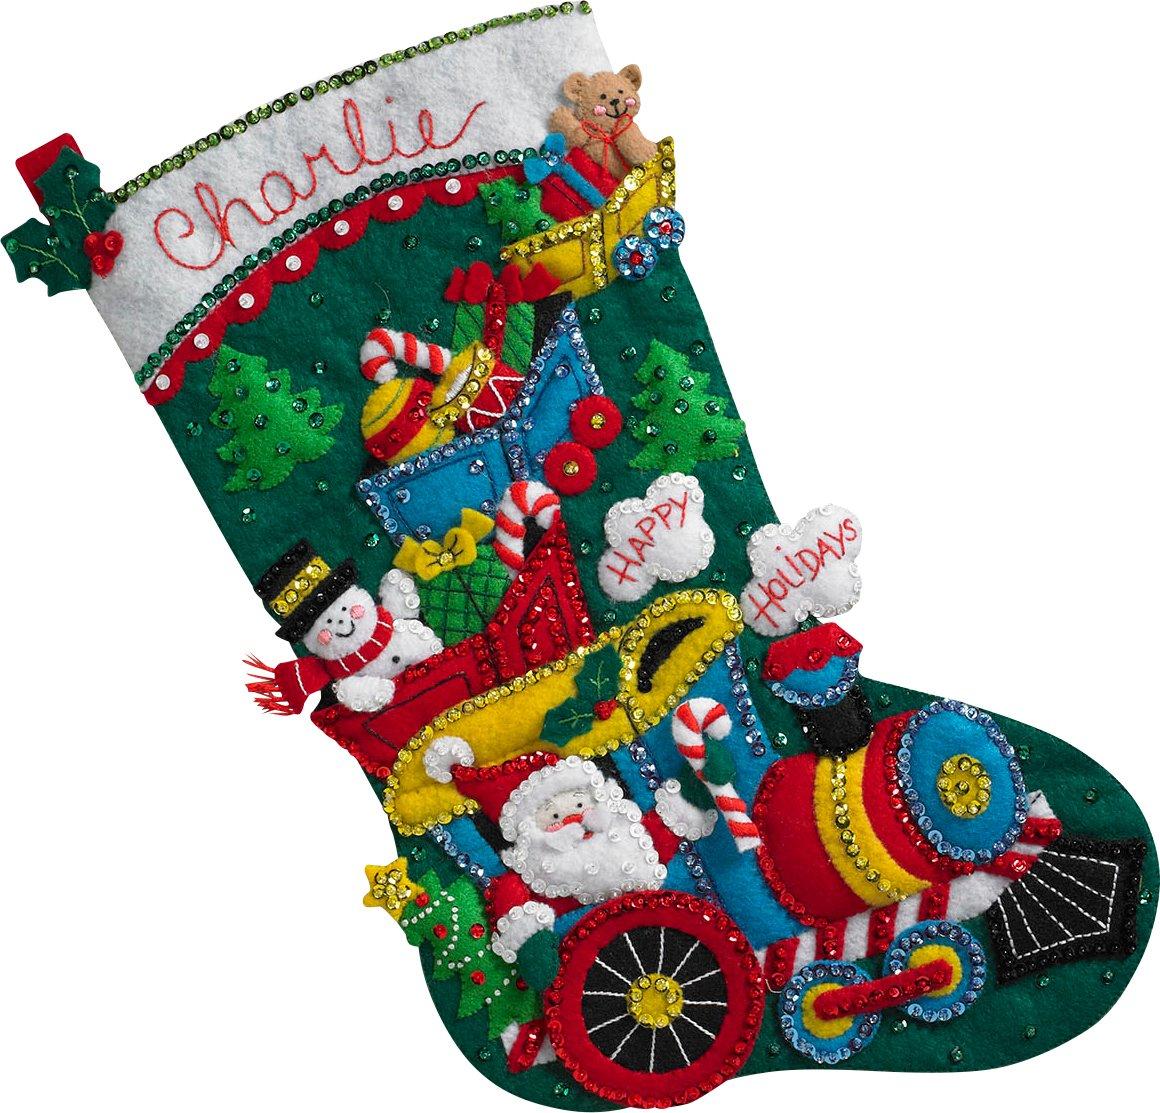 BUCILLA 86708 Choo Santa Stocking Kit by Bucilla